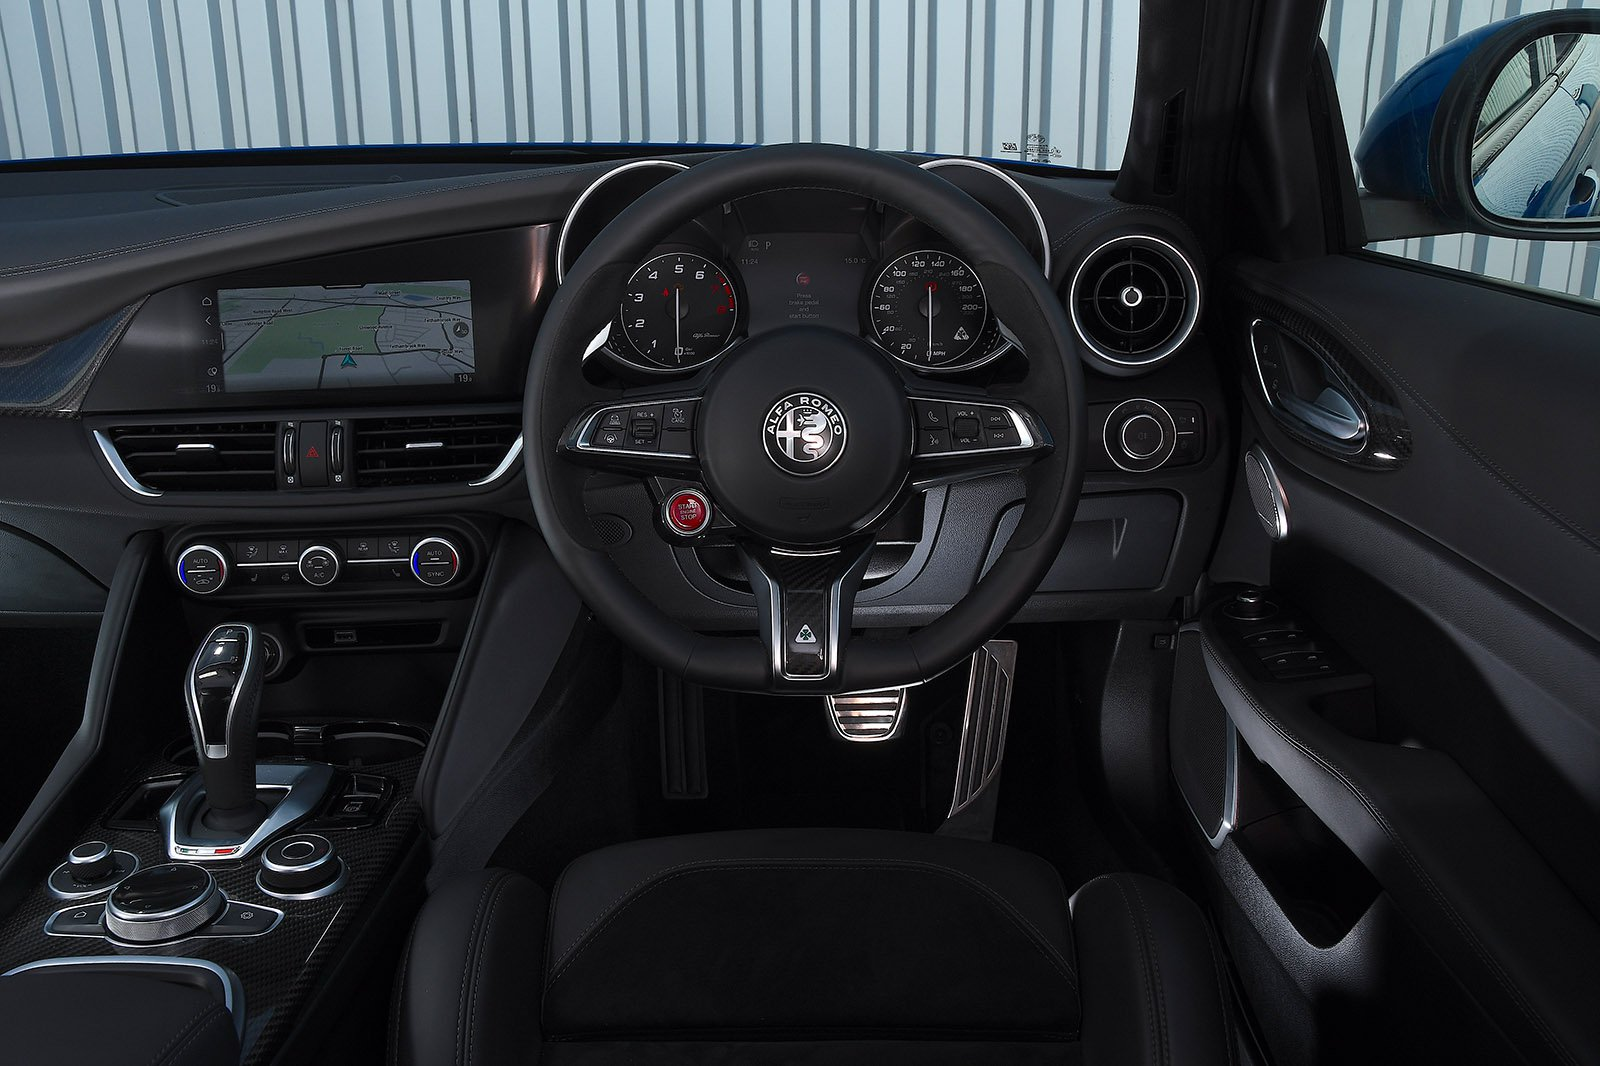 Alfa Romeo Giulia Quadrifoglio 2020 dashboard